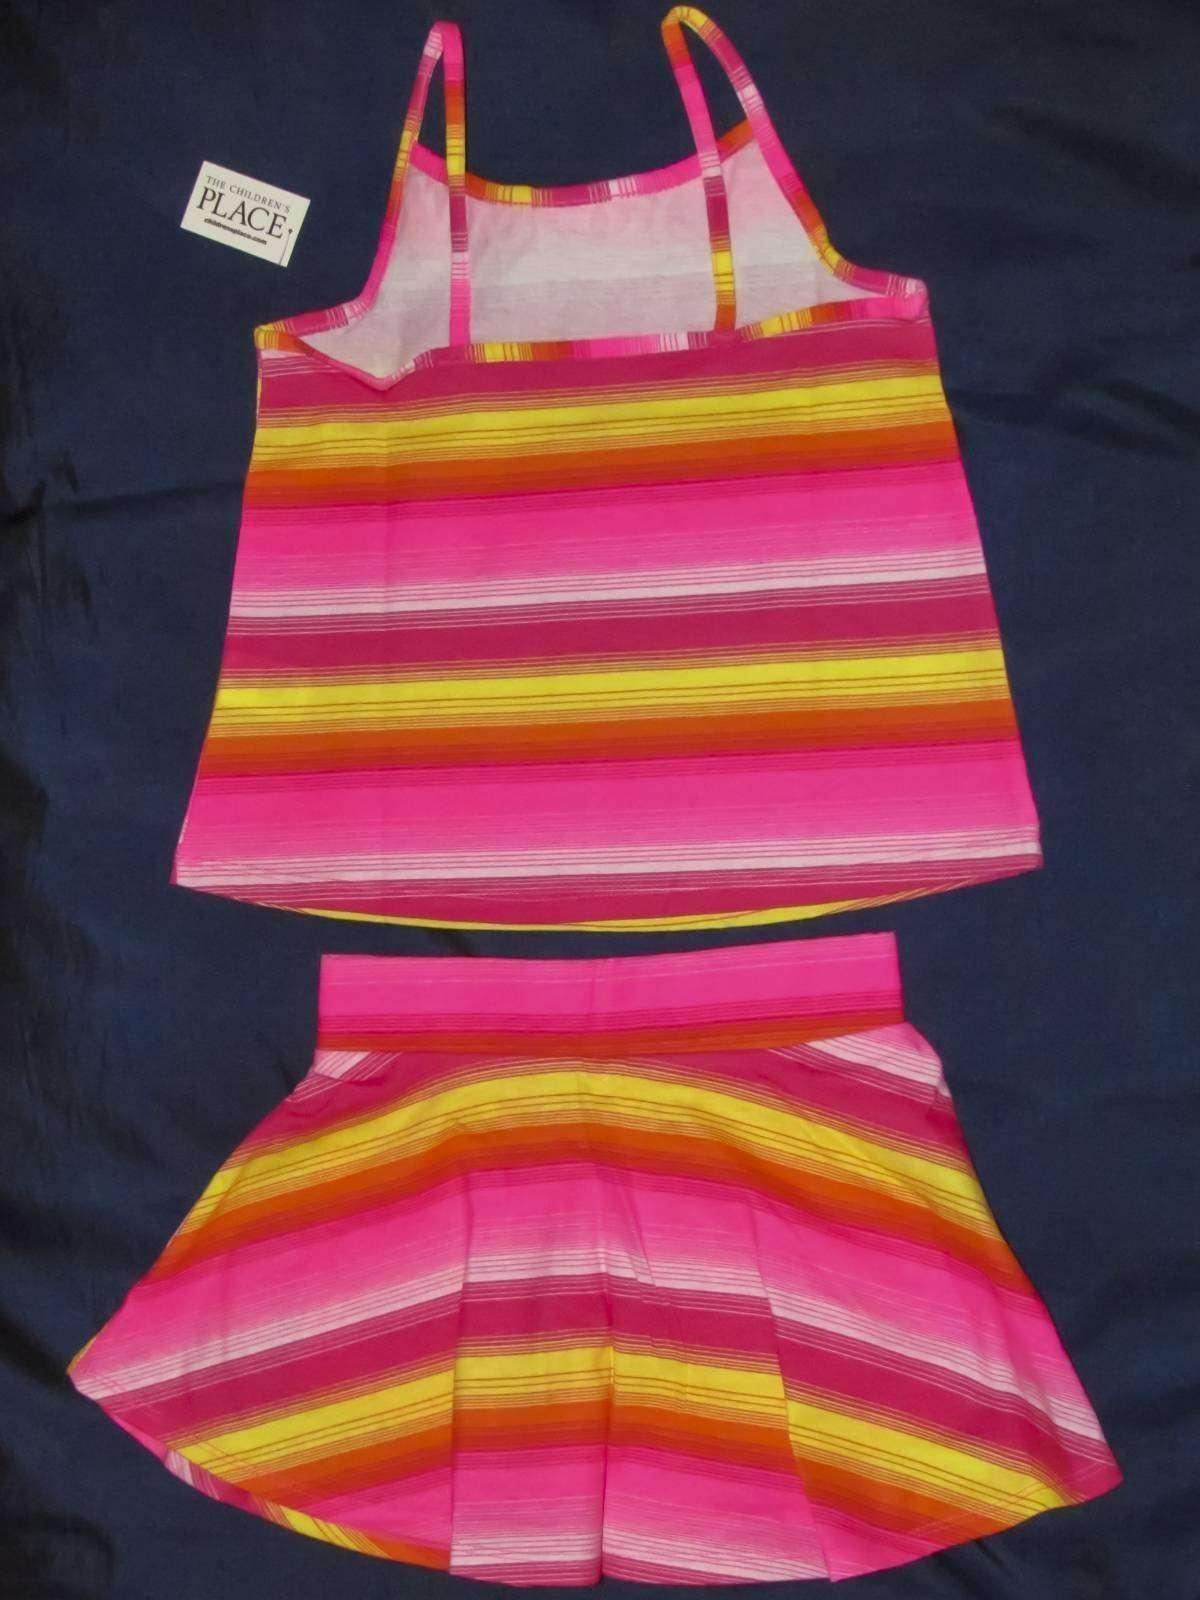 Childrens Place: Радужная юбочка для девочки 5-6 лет